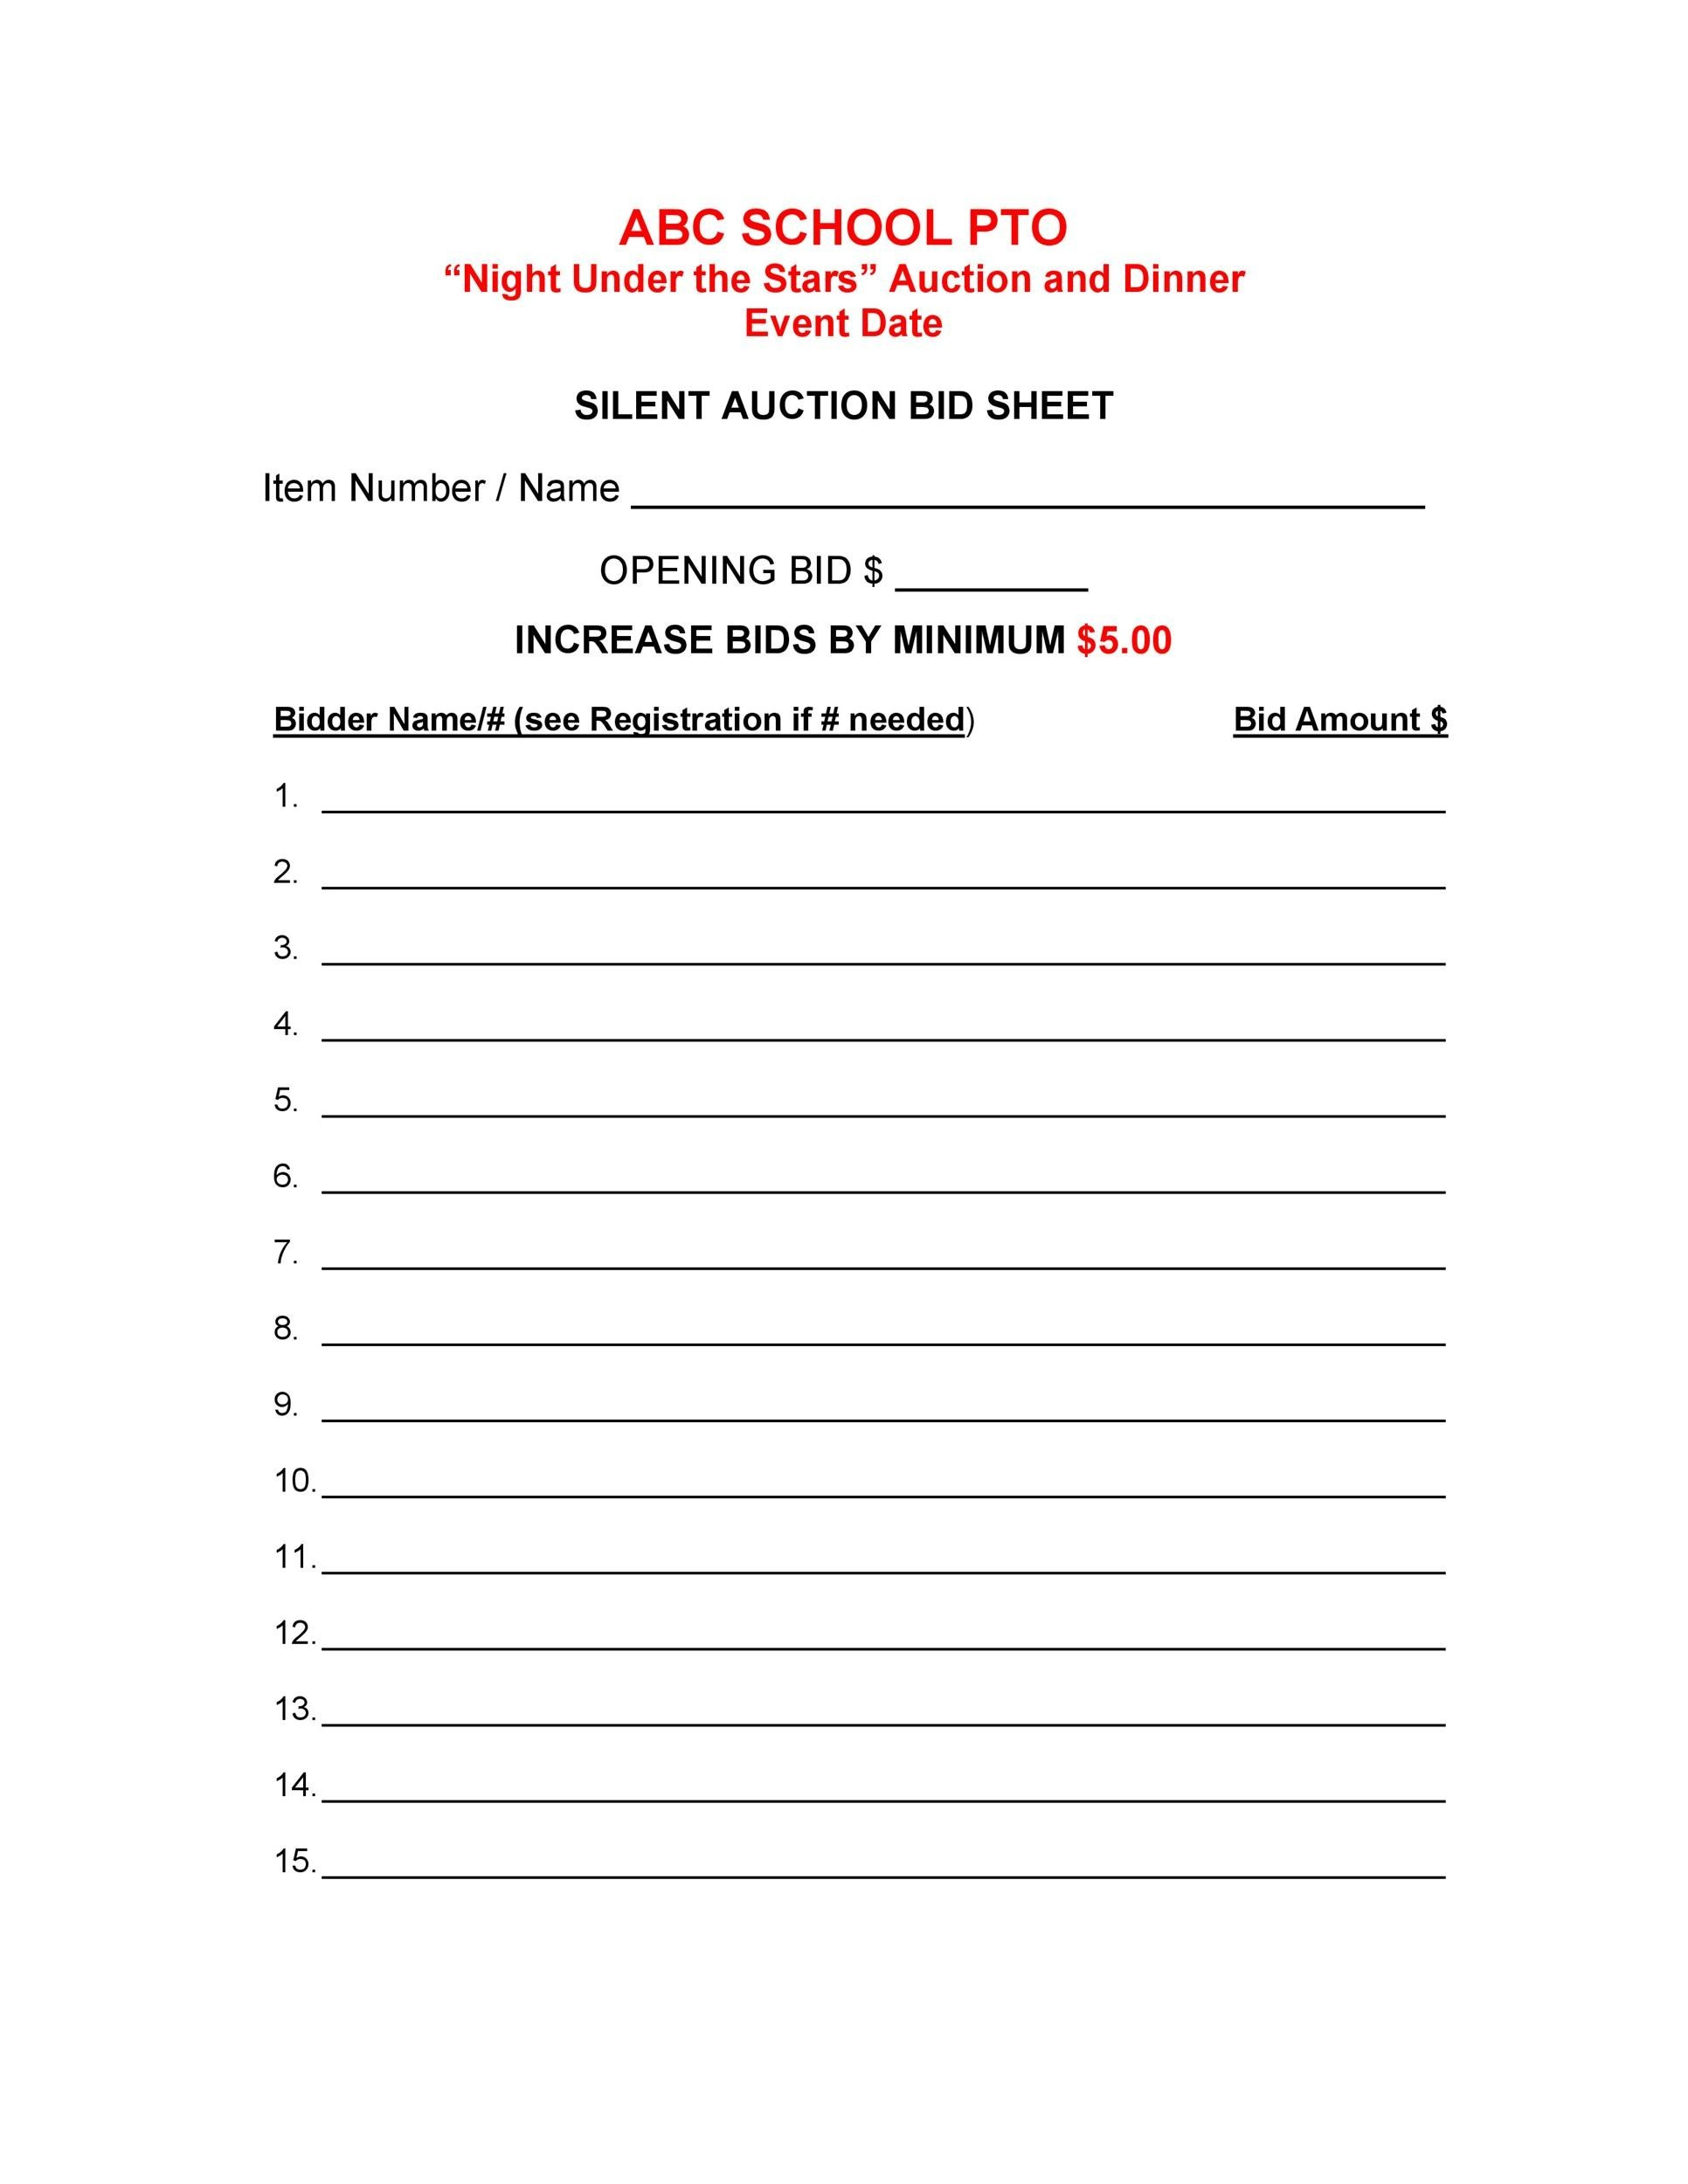 40 Silent Auction Bid Sheet Templates Word Excel